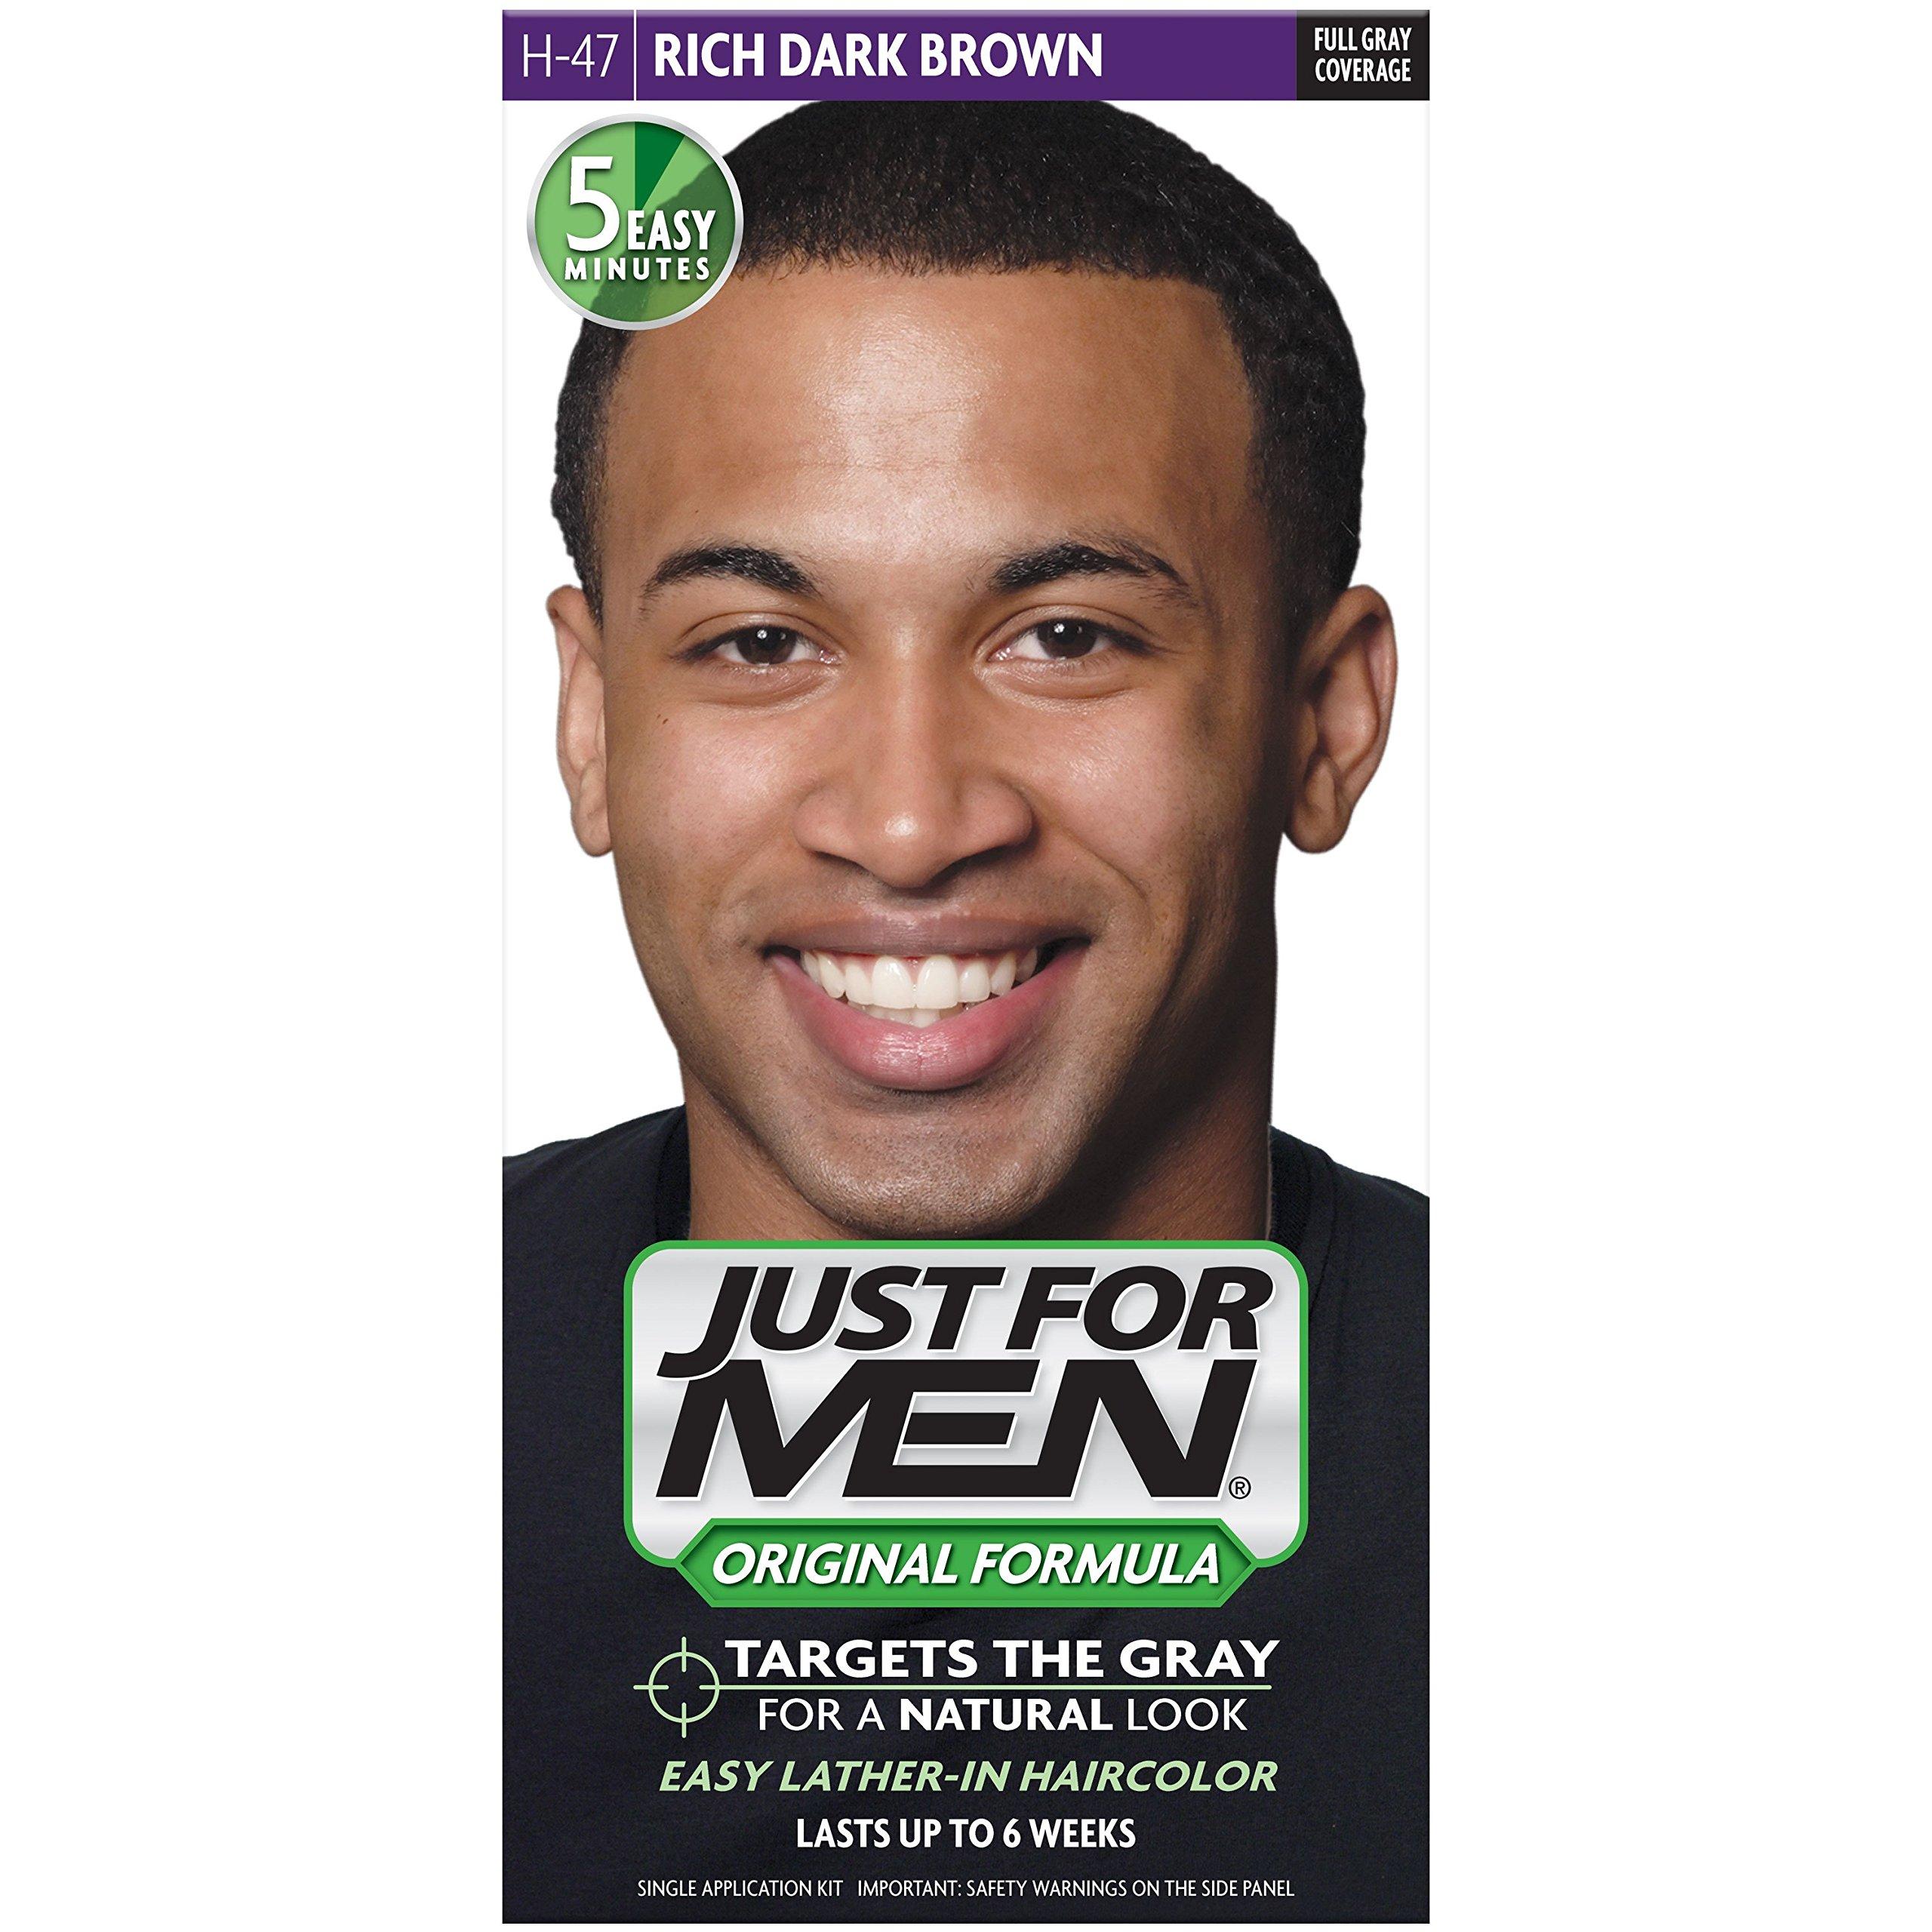 Just For Men Original Formula Men's Hair Color, Rich Dark Brown, (Pack of 12) by Just for Men (Image #2)